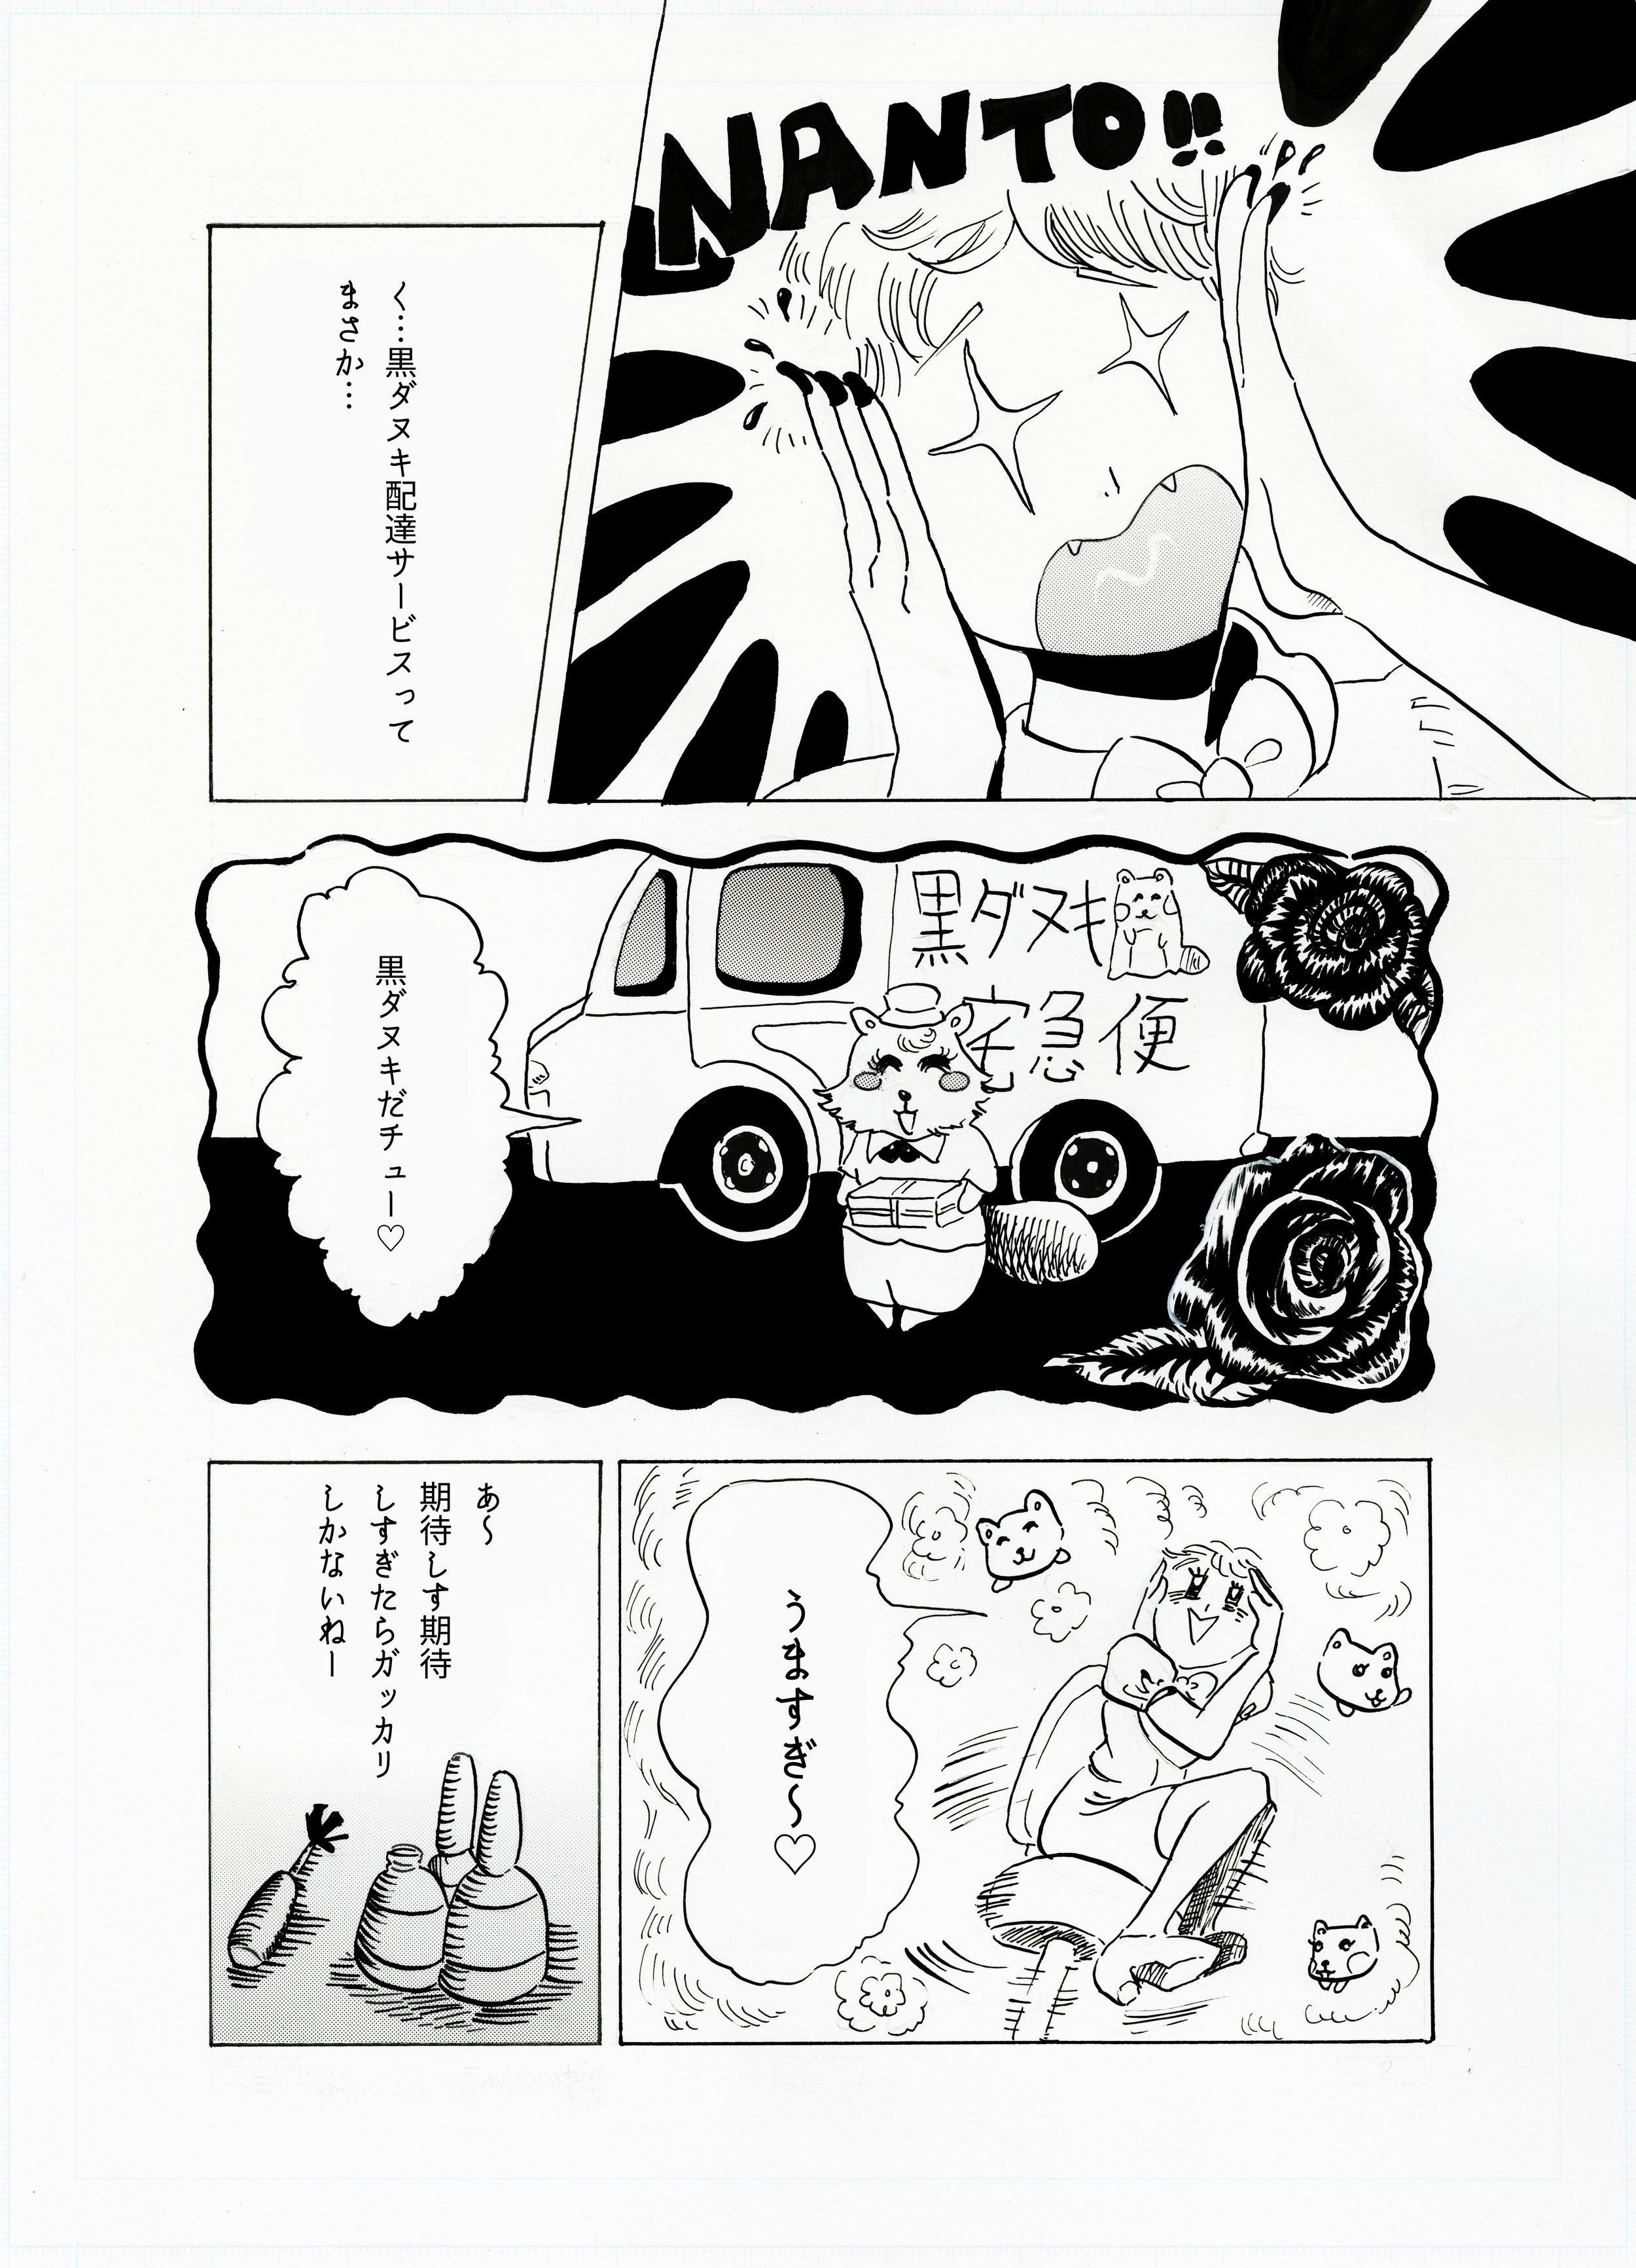 ponko002text.jpg